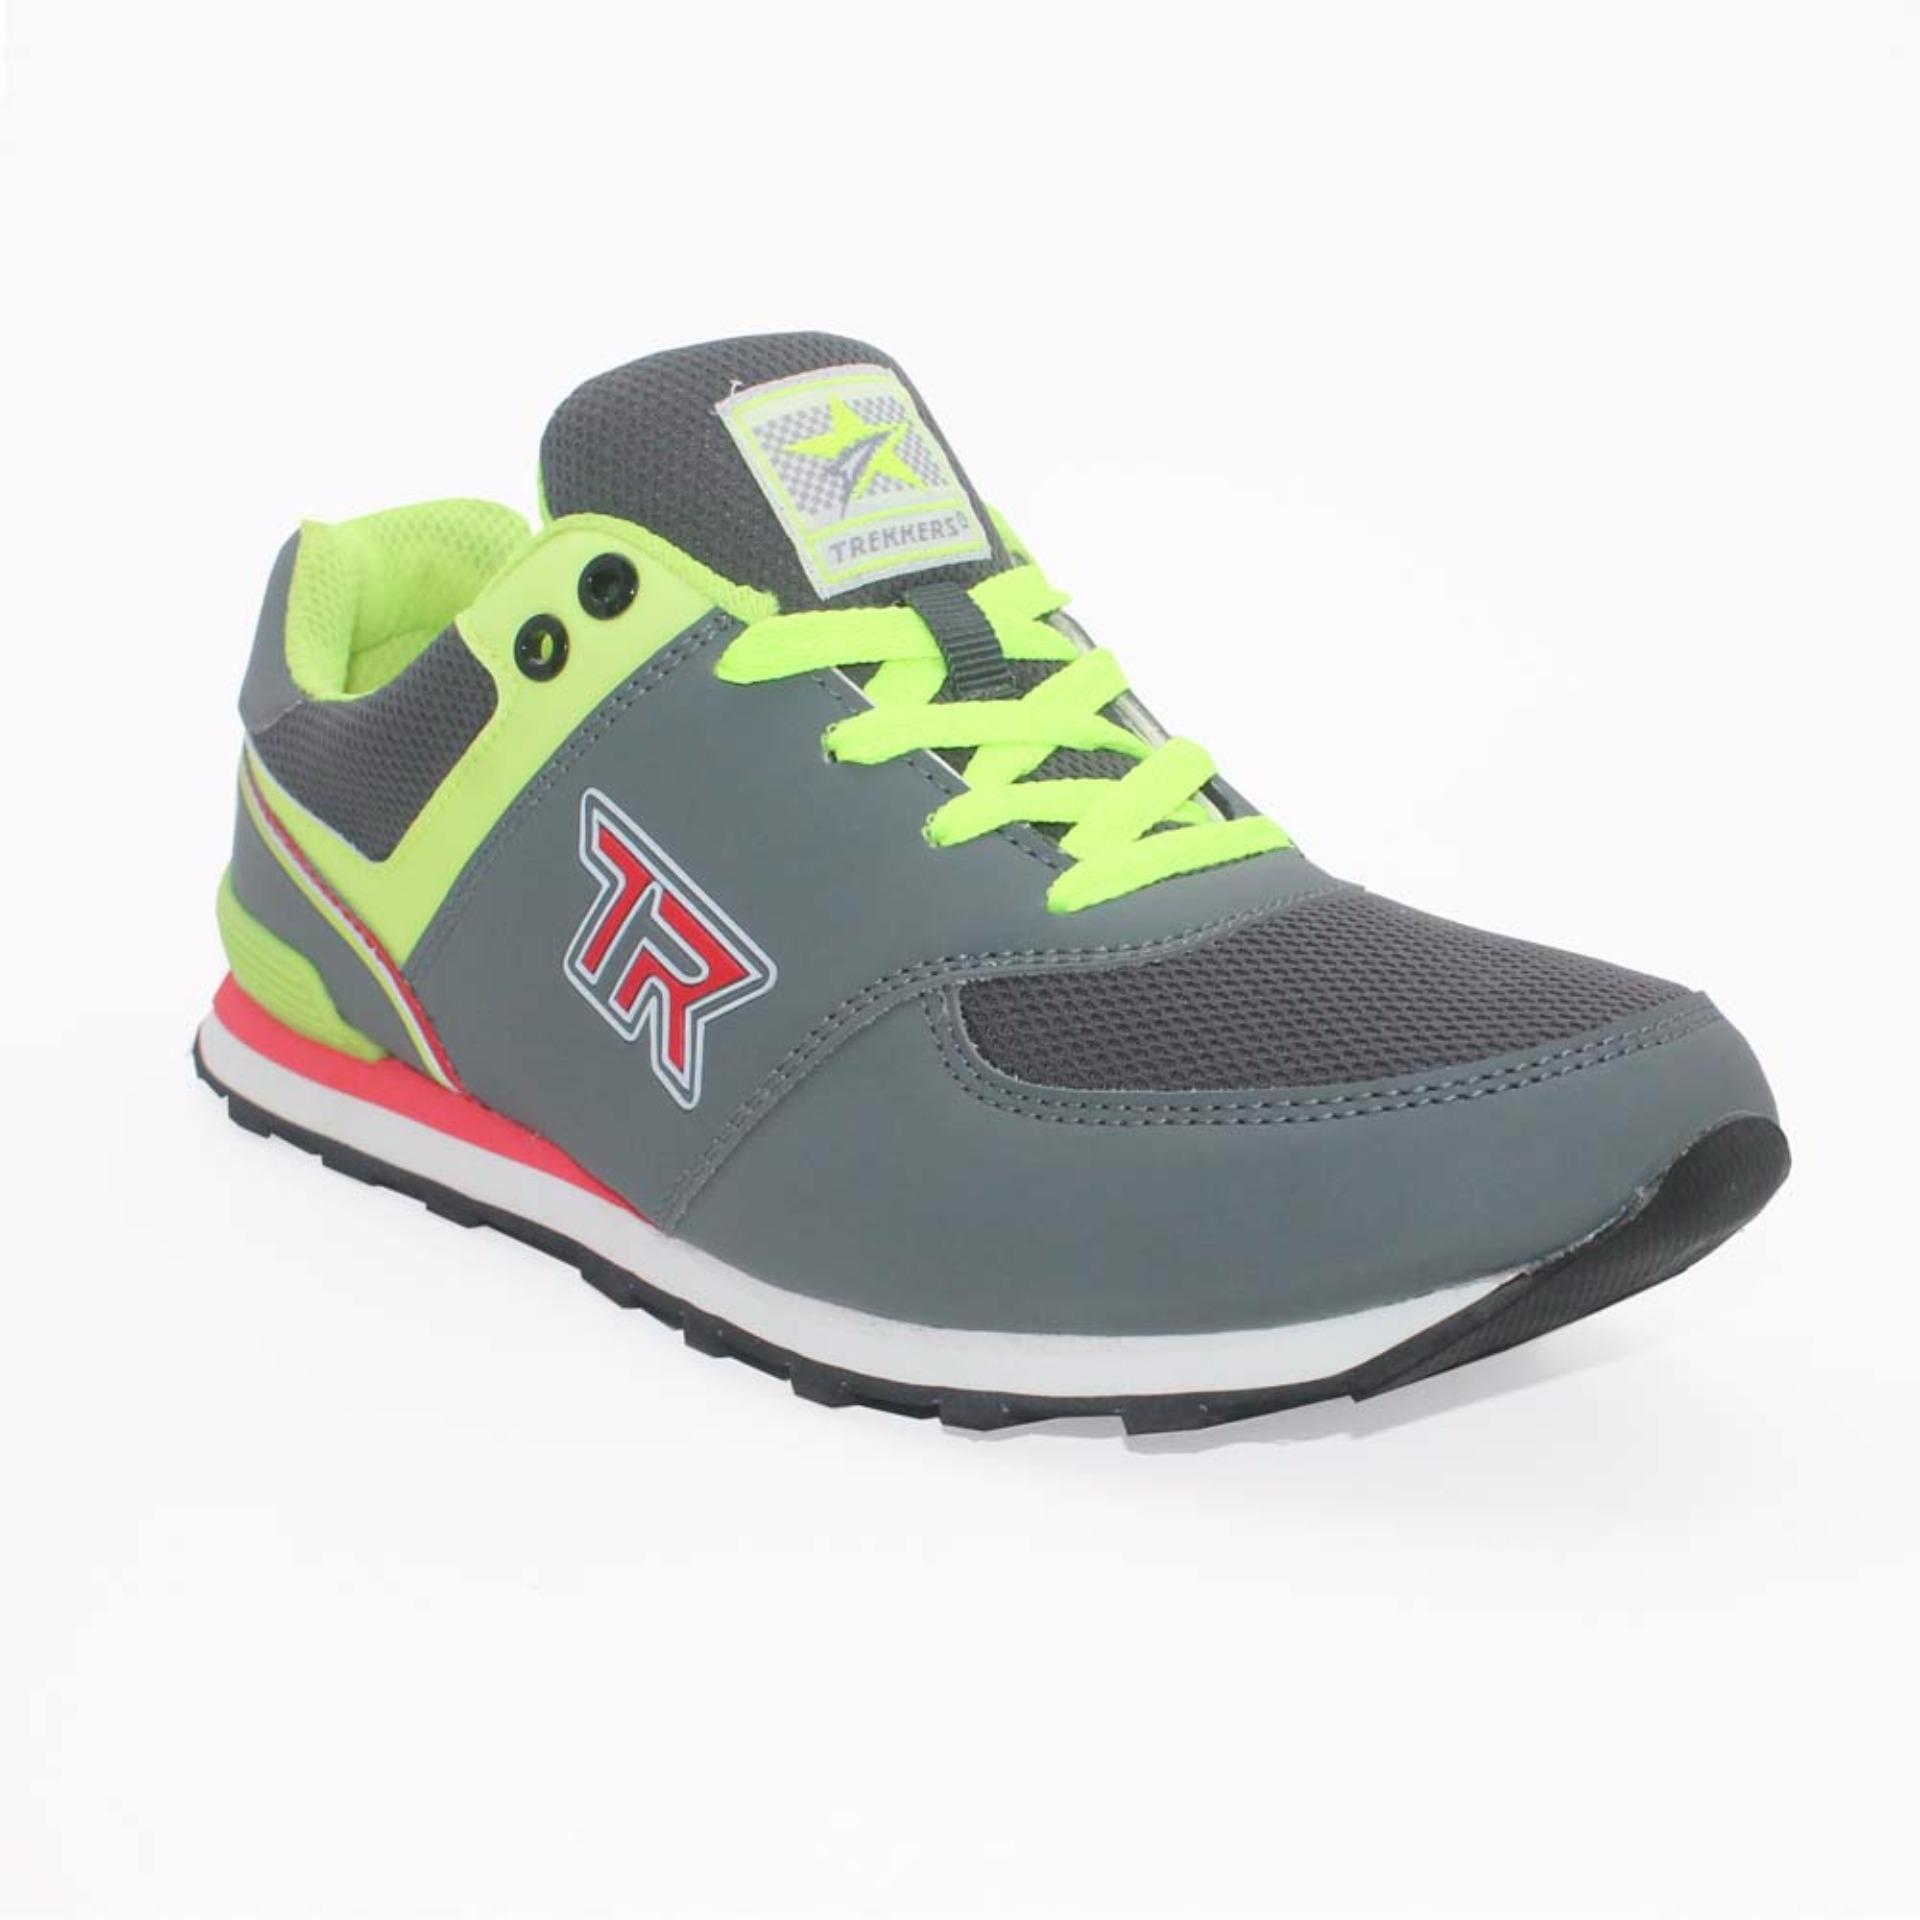 Trekkers JB-Bellagio 2 Sepatu Olahraga Laki-laki Warna Abu Tua/ Hijau Terang